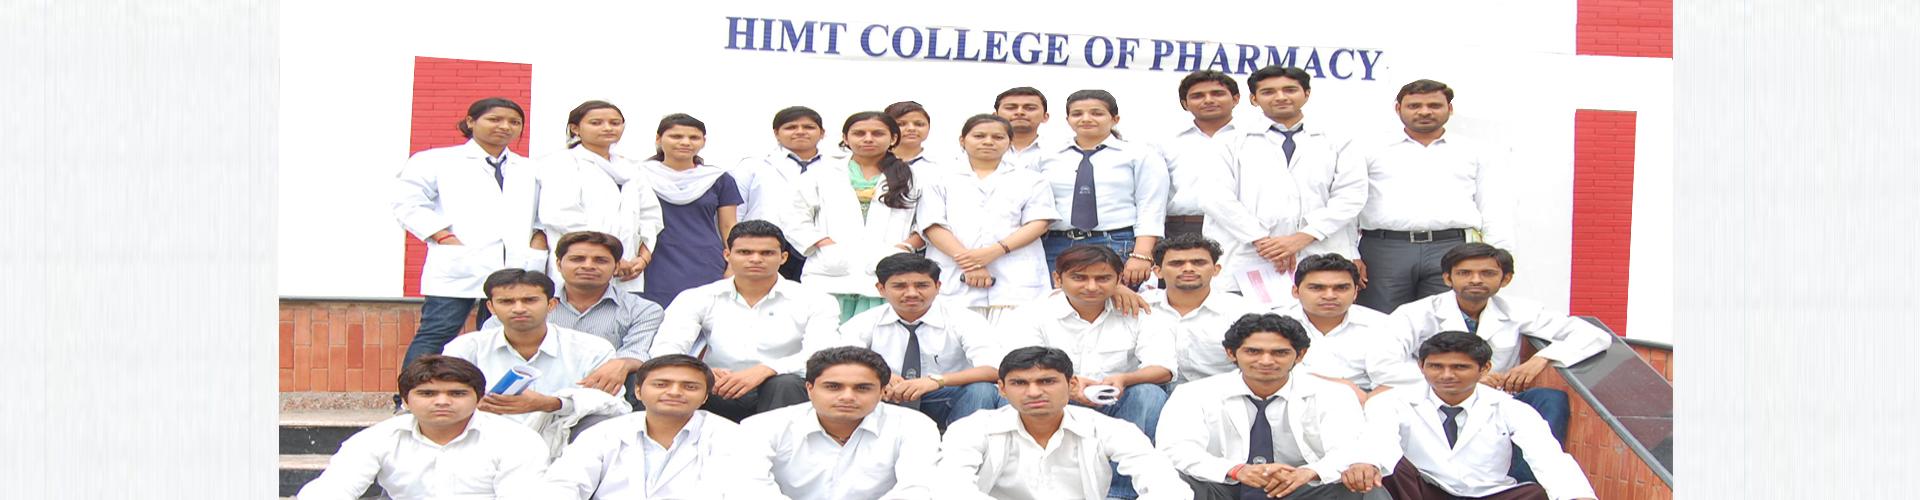 HIMT COLLEGE OF PHARMACY, Gautam Budh Nagar